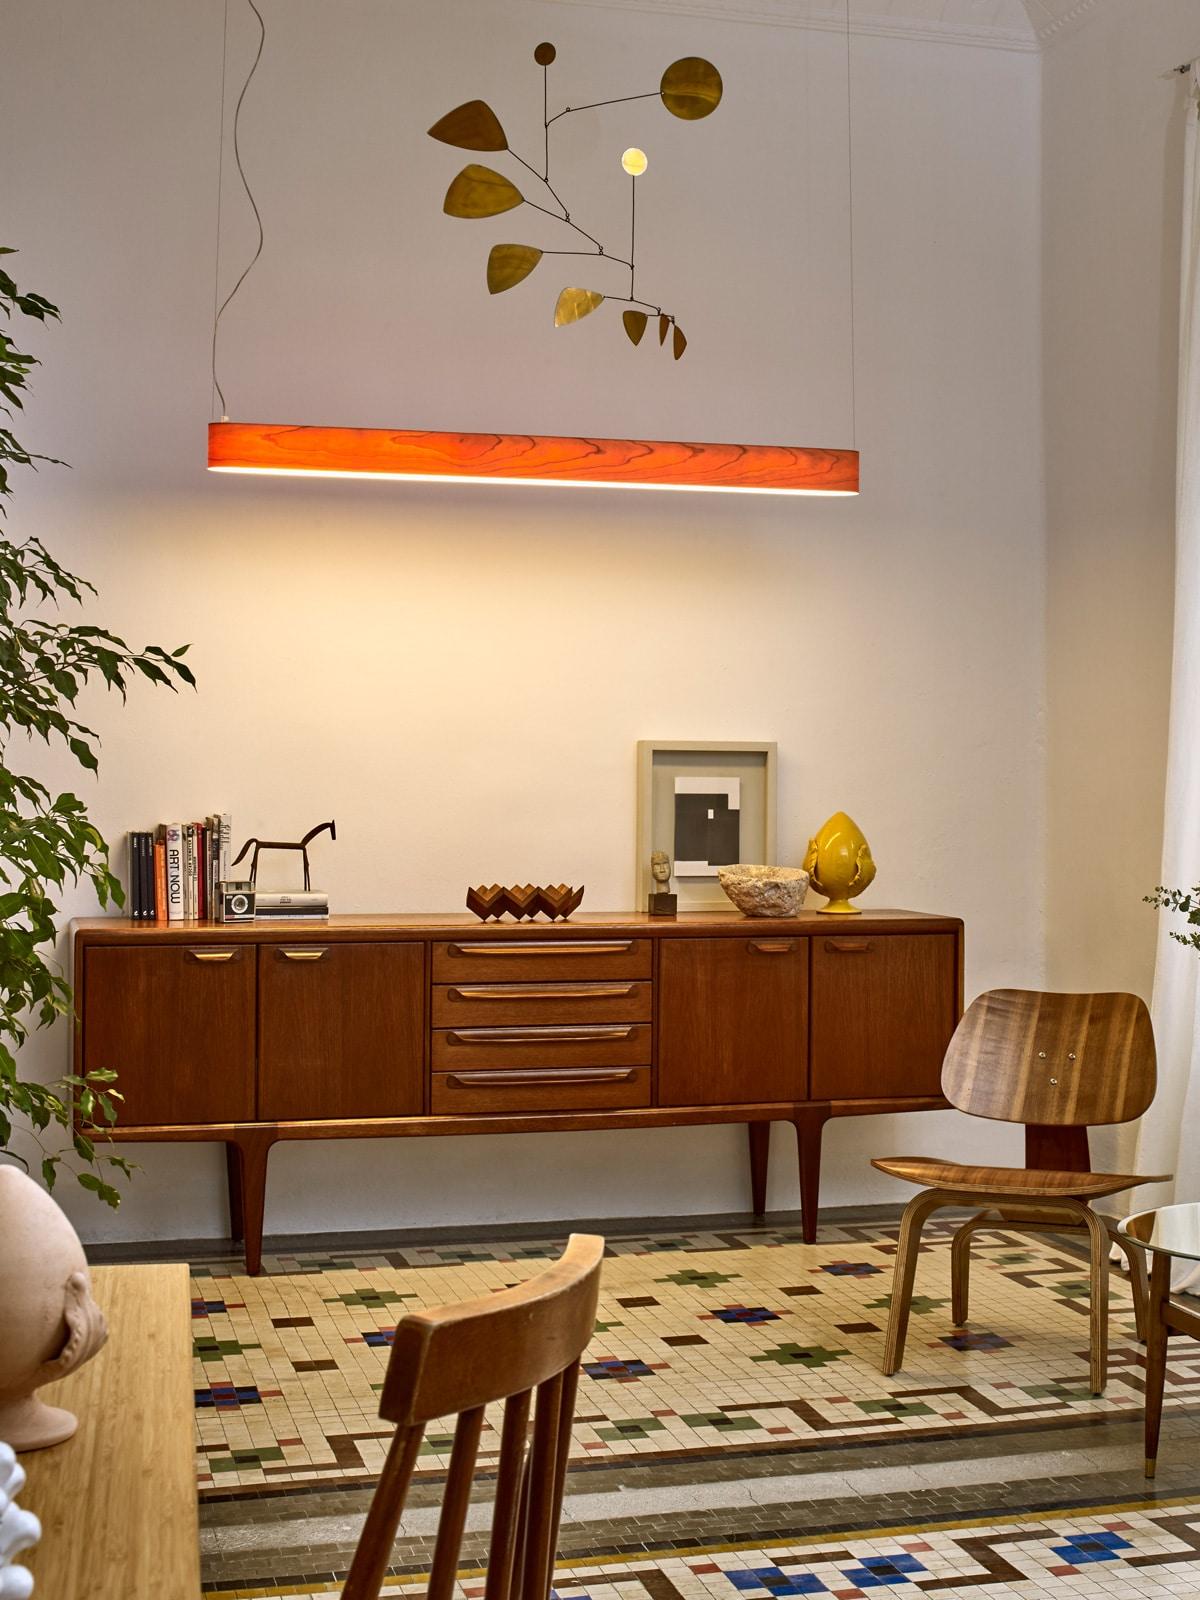 DesignOrt Blog: LZF Designer - I-Club Slip LED Holzleuchte von LZF